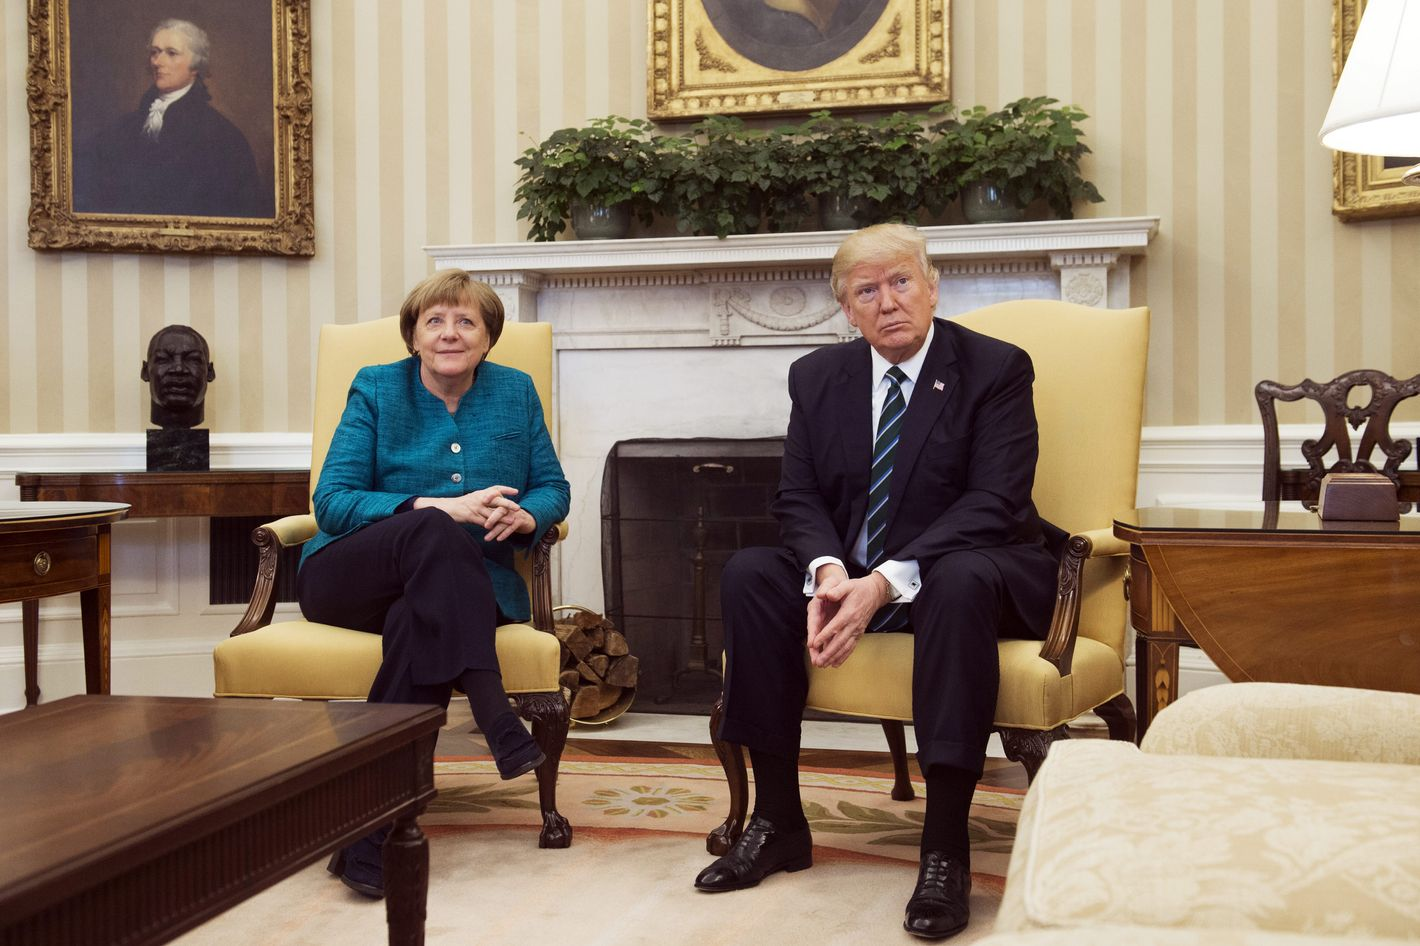 great trump verweigert merkel handschlag